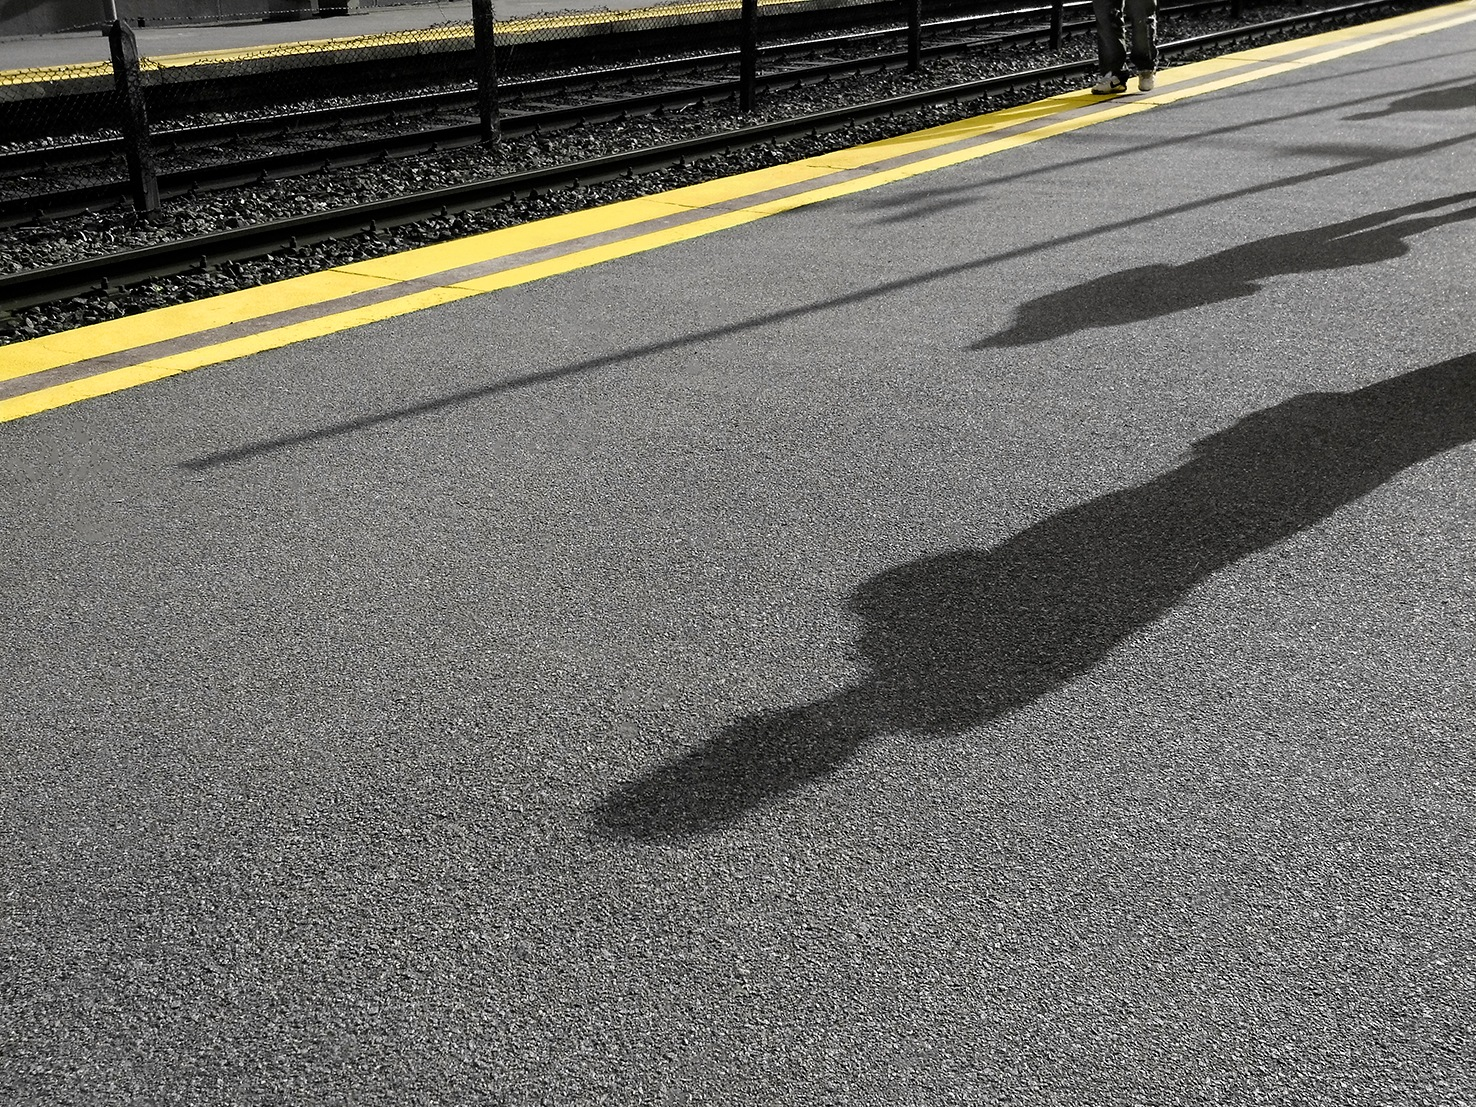 Estacion / Station by enruco